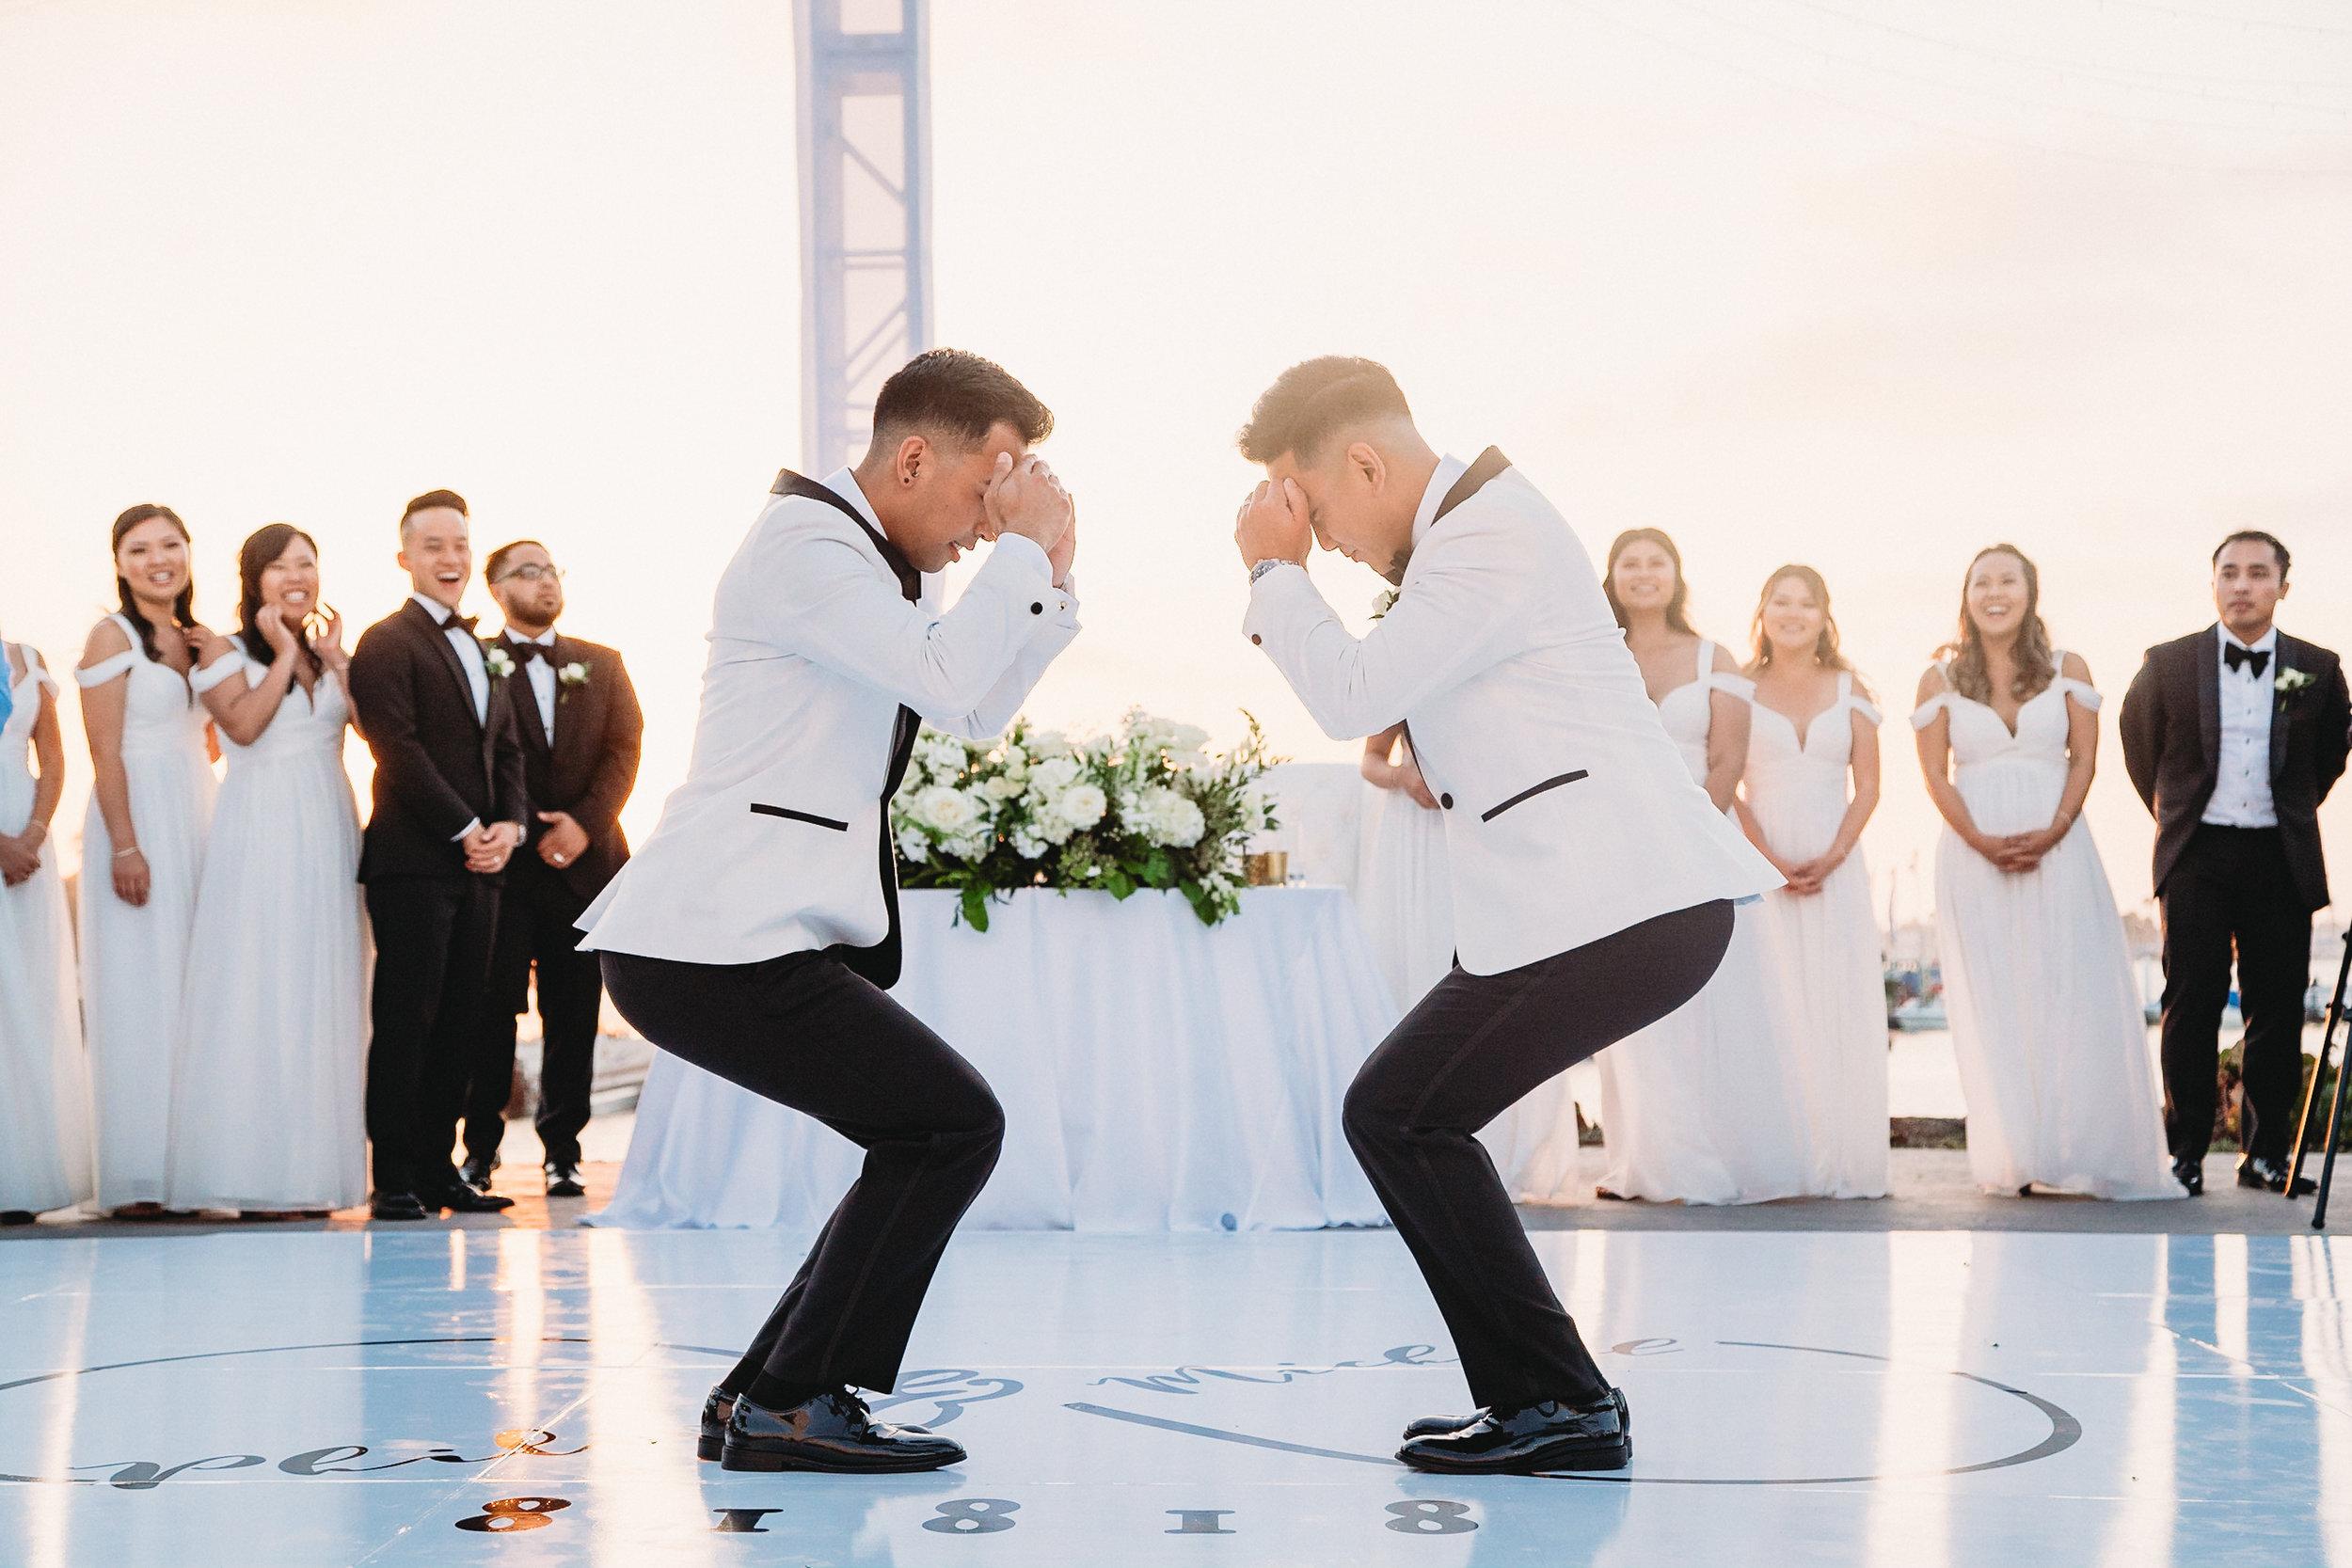 rebeccaylasotras-sandiego-lgbt-wedding-photography-70.jpg